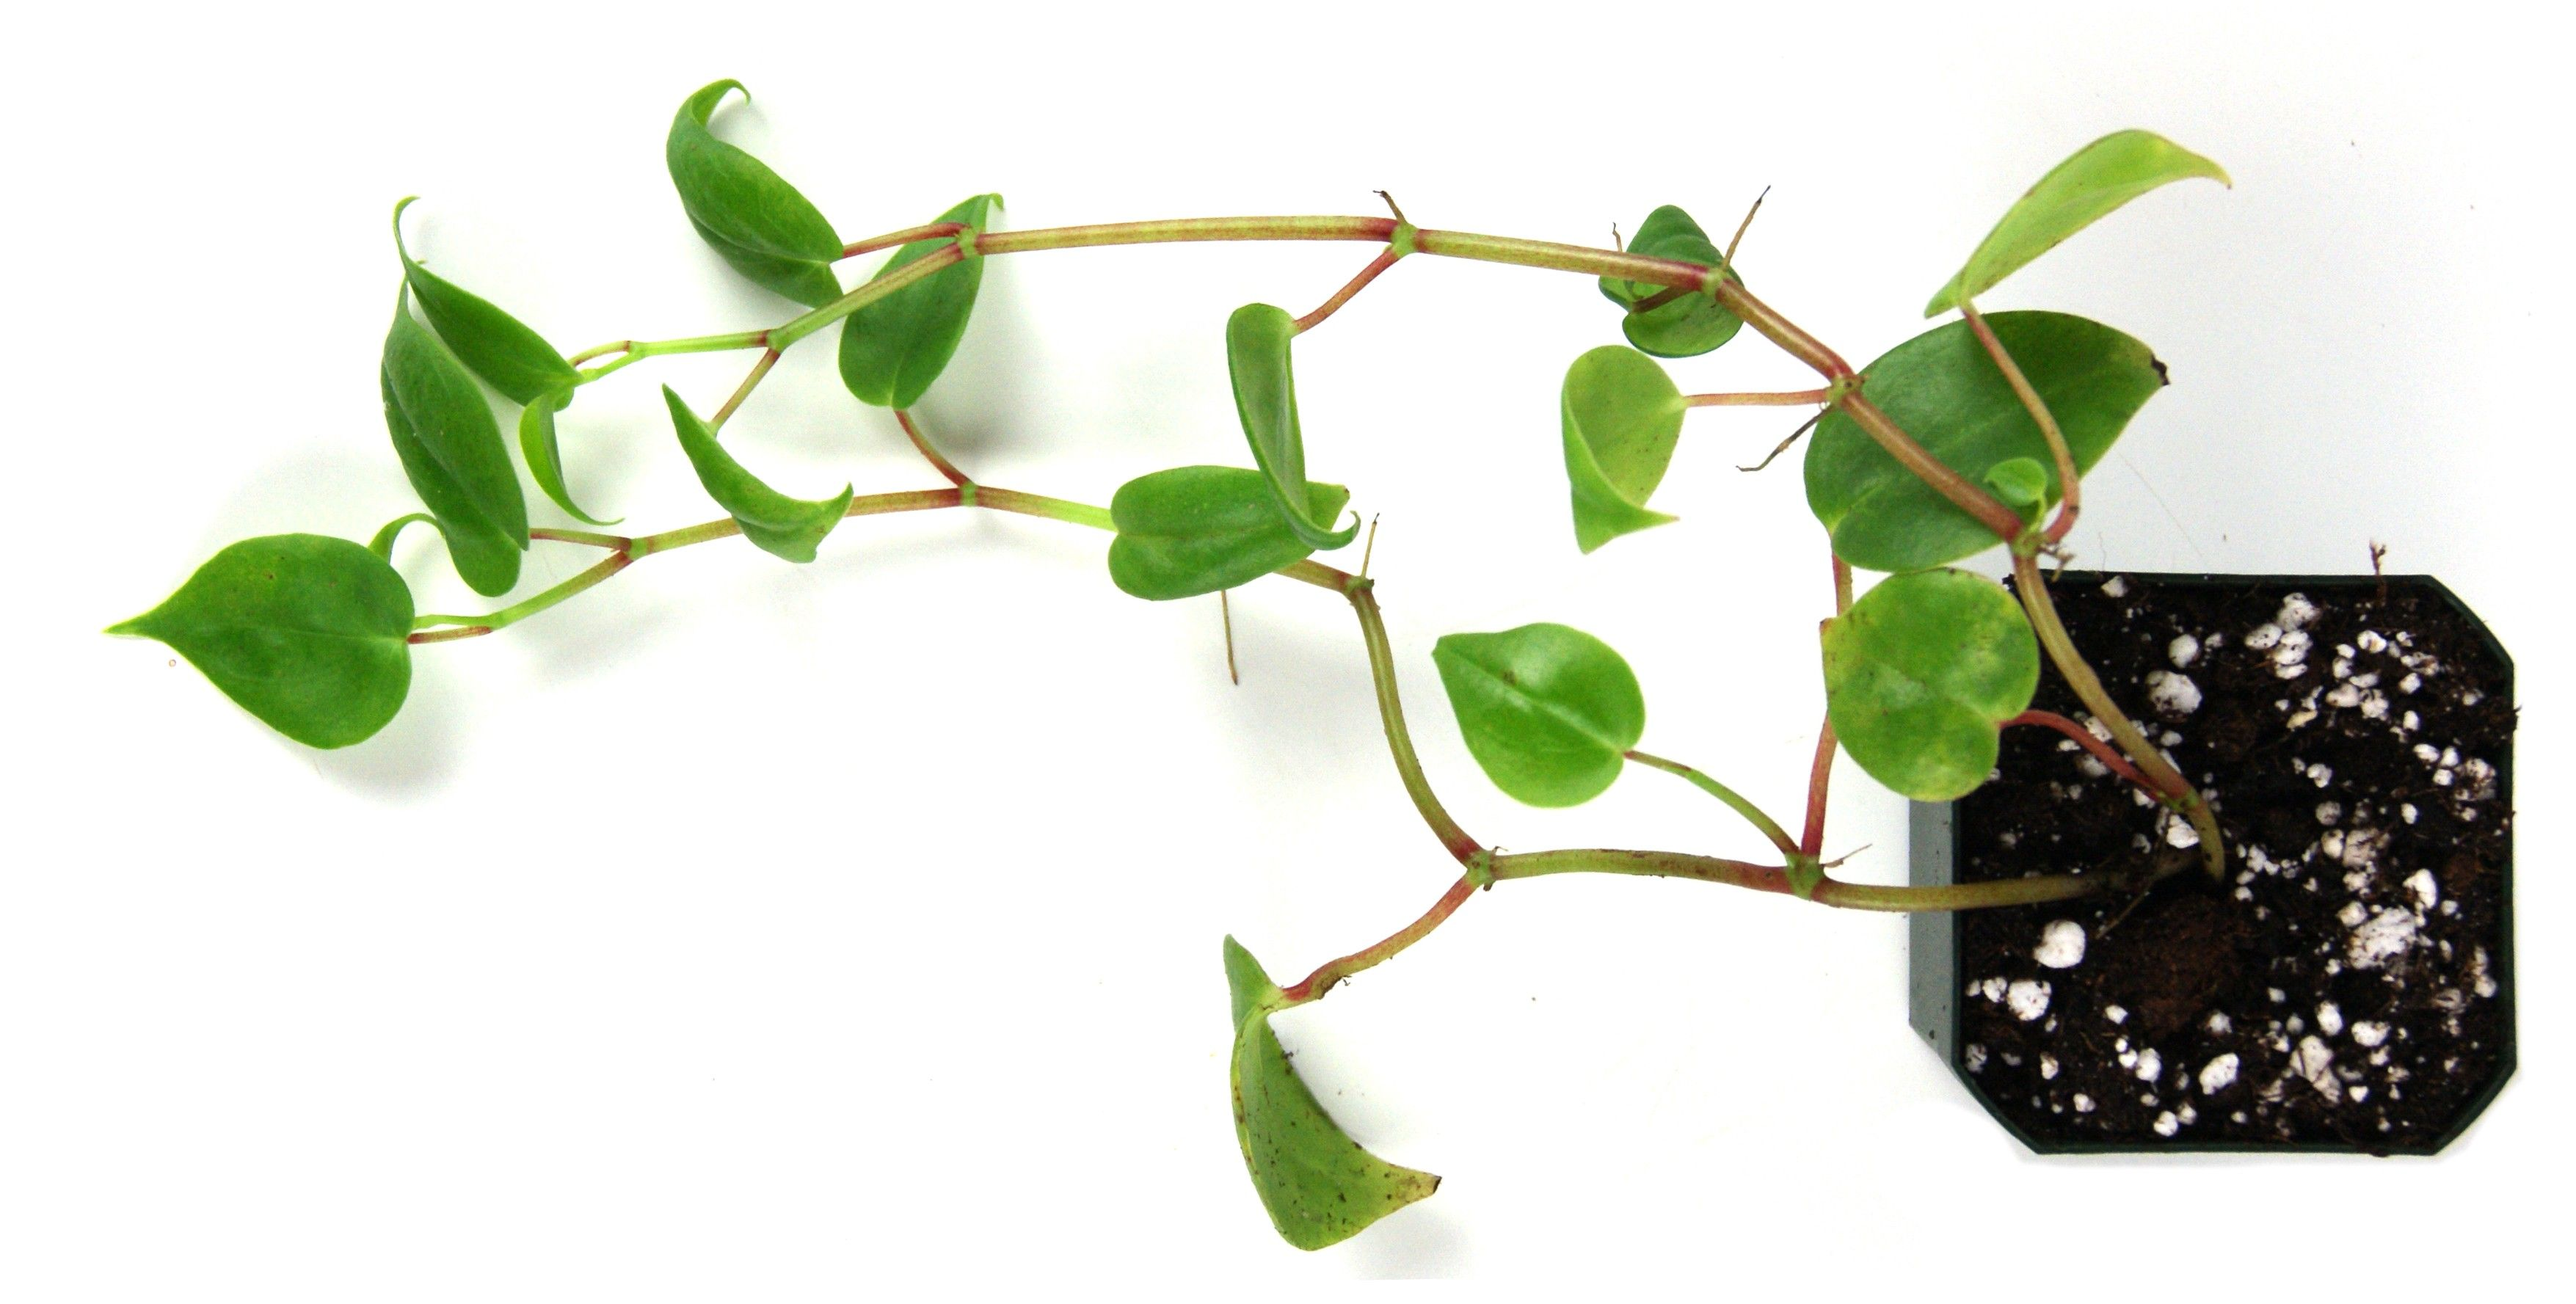 Baby Rubber Plant, Peperomia Obtusifolia - Cat Safe Houseplants - Pinterest